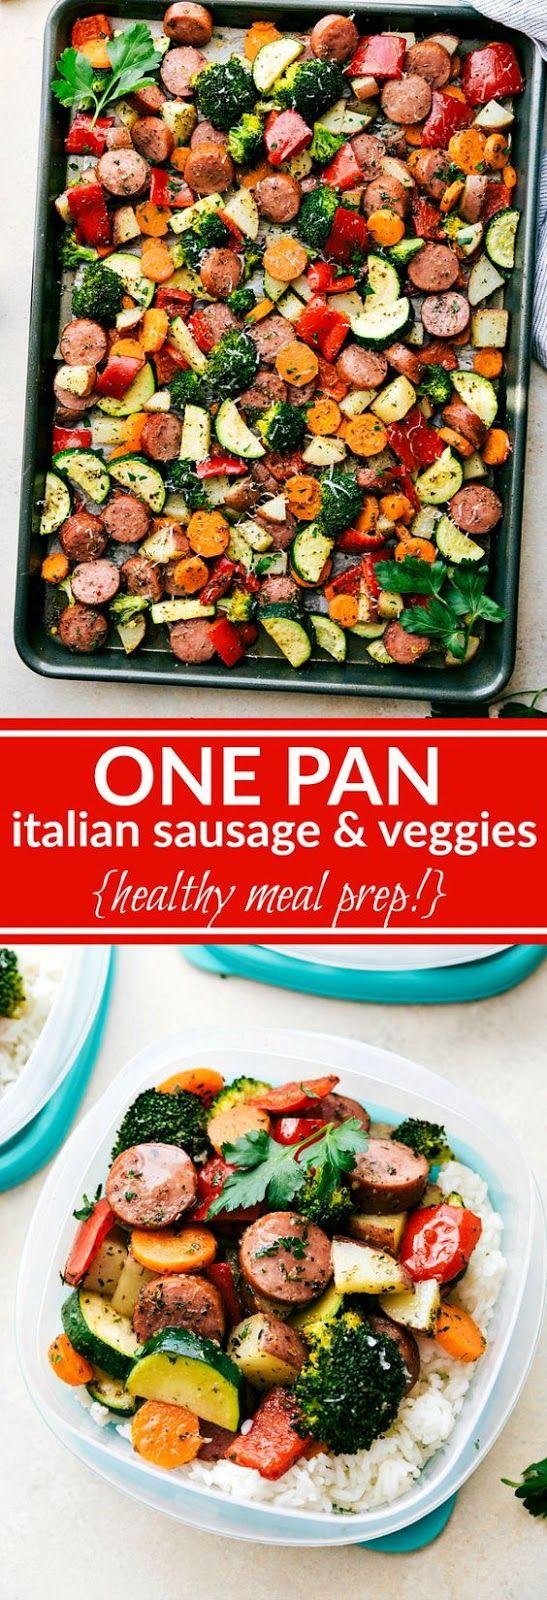 One Pan Italian Sausage and Veggies | Cake And Food Recipe